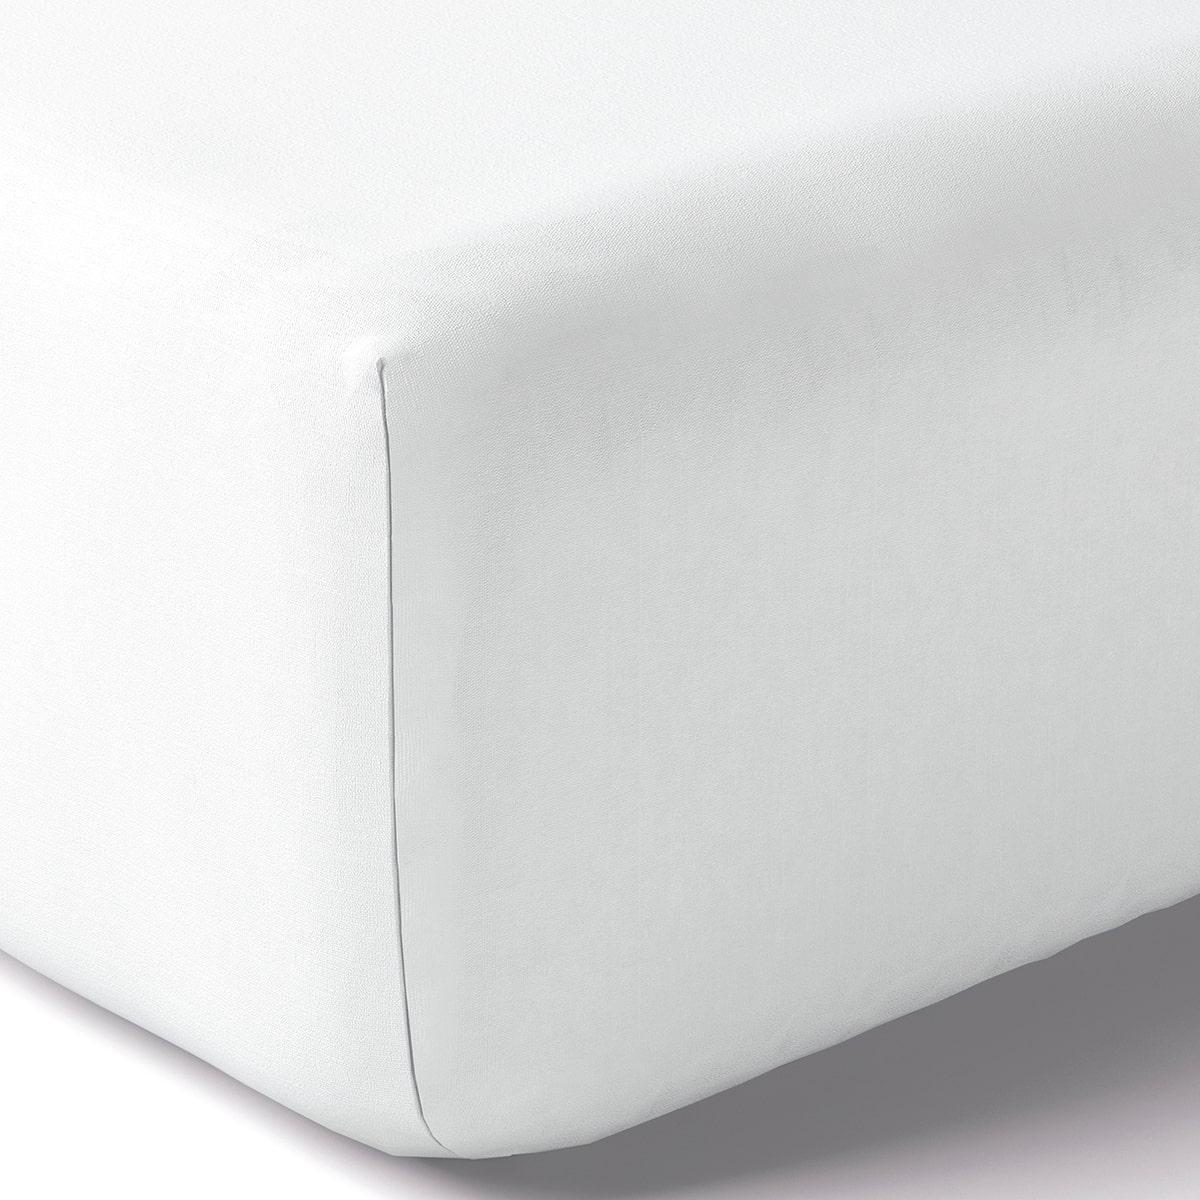 Drap housse coton 80x200 cm blanc